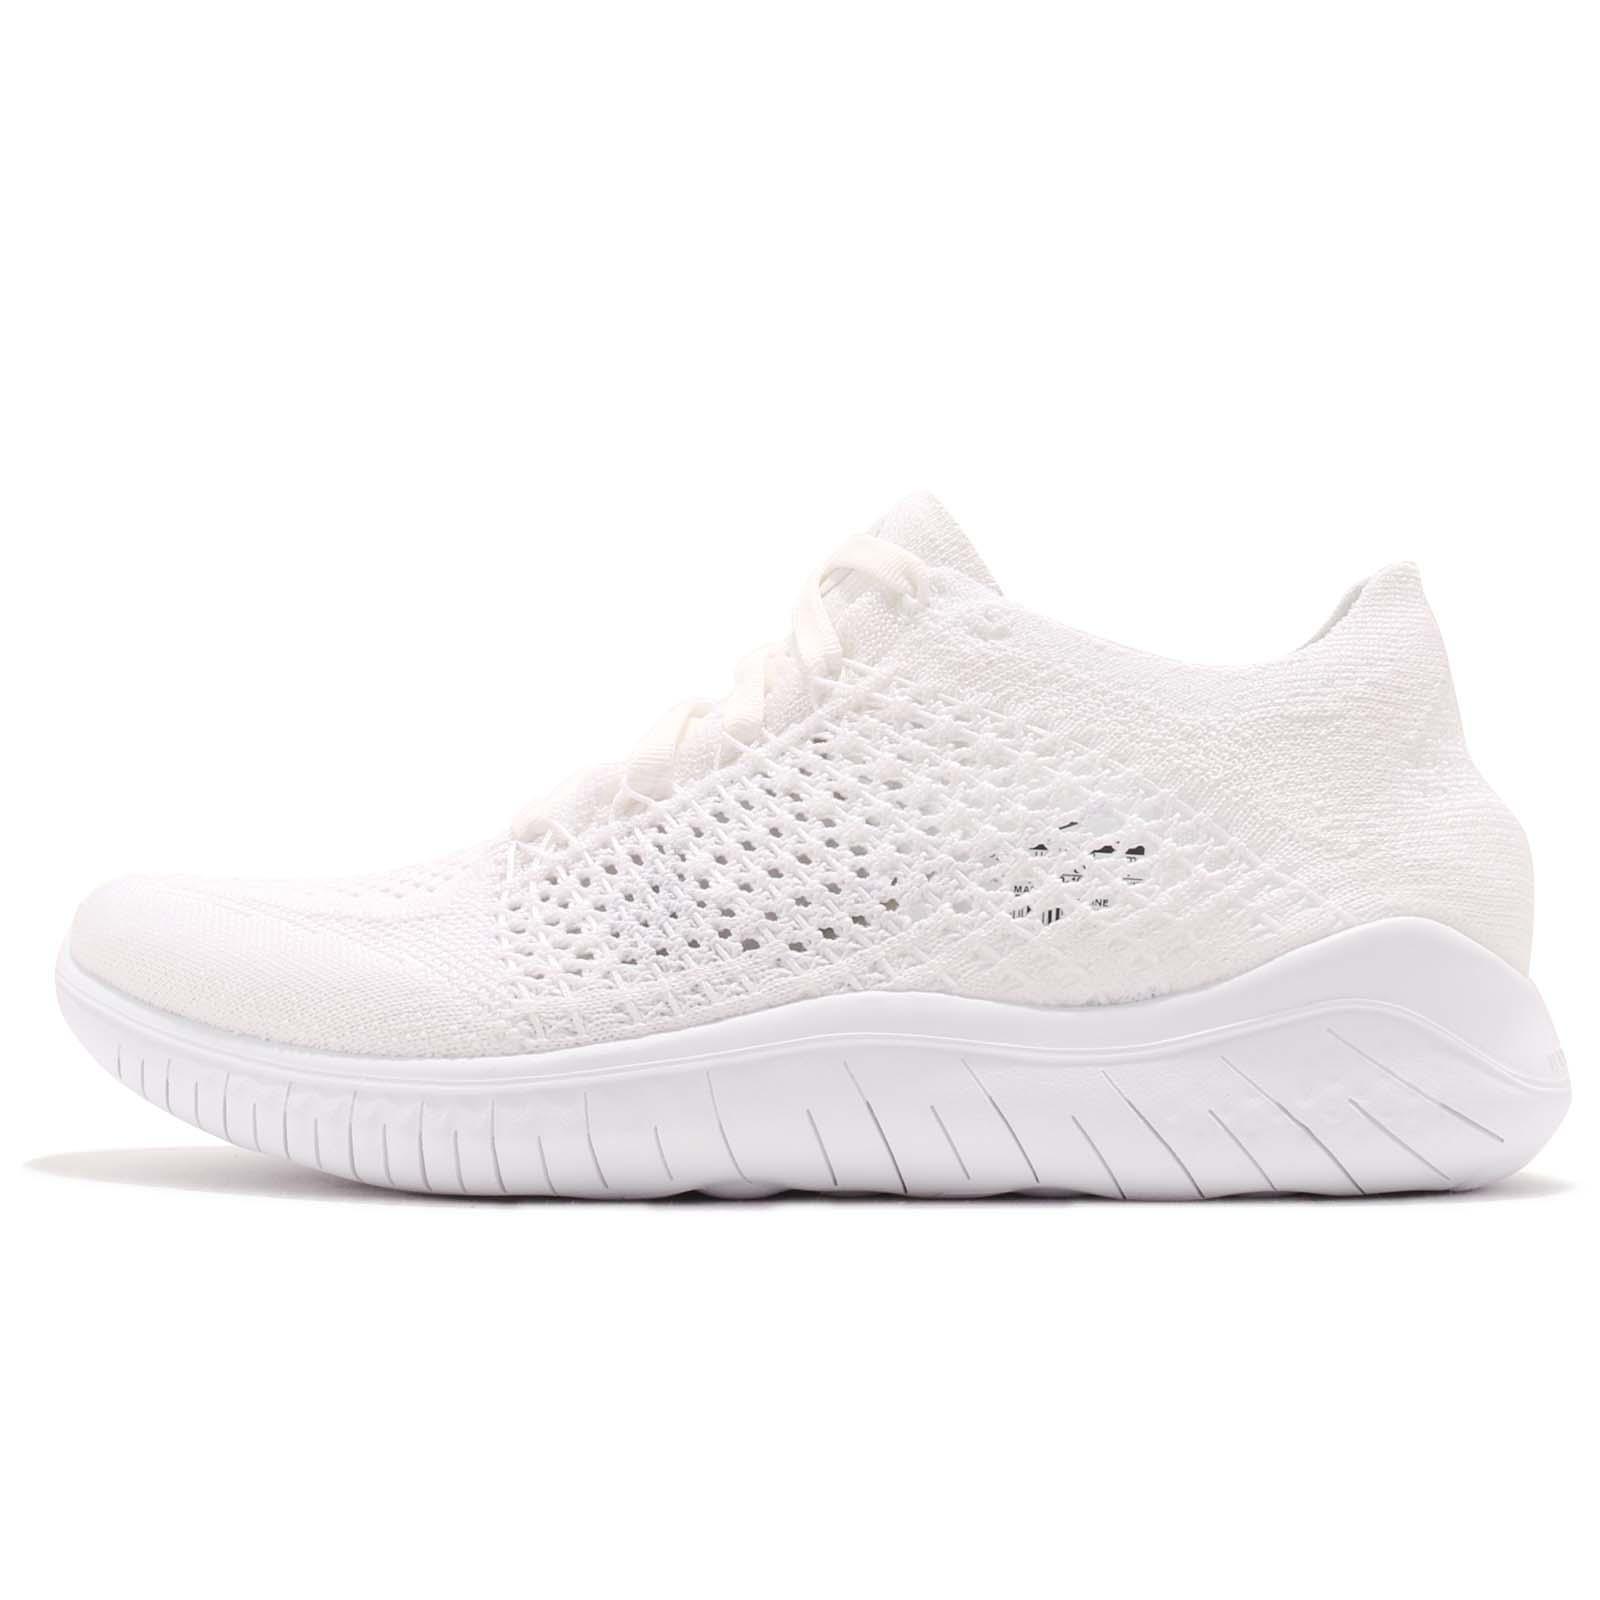 0b87769ca00c6 Nike Wmns Free RN Flyknit 2018 Triple White Women Running Shoes 942839-103